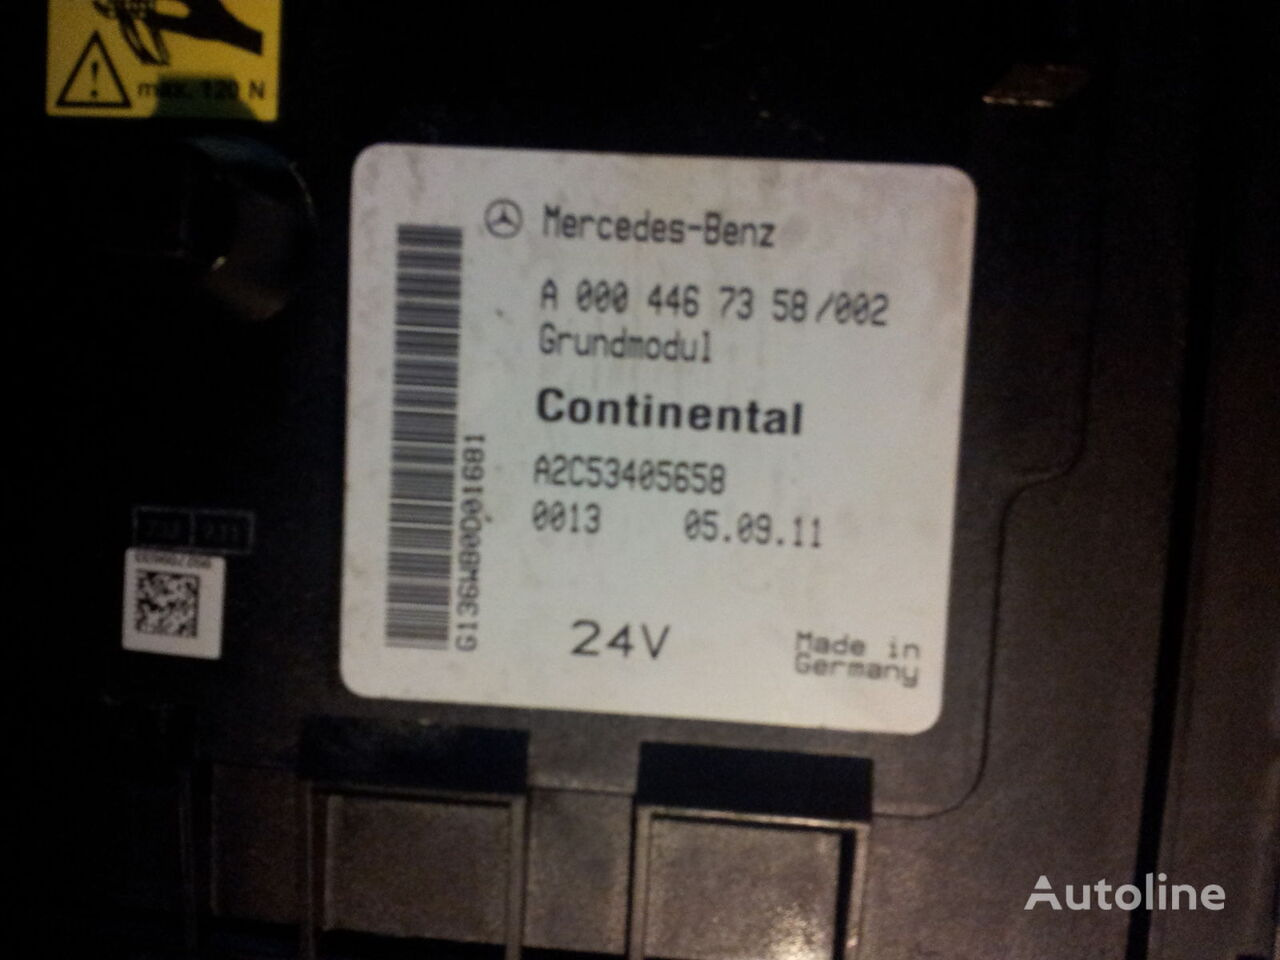 MERCEDES-BENZ Actros MP2, MP3 GM unit, Grundmodul, Fuse box, ...